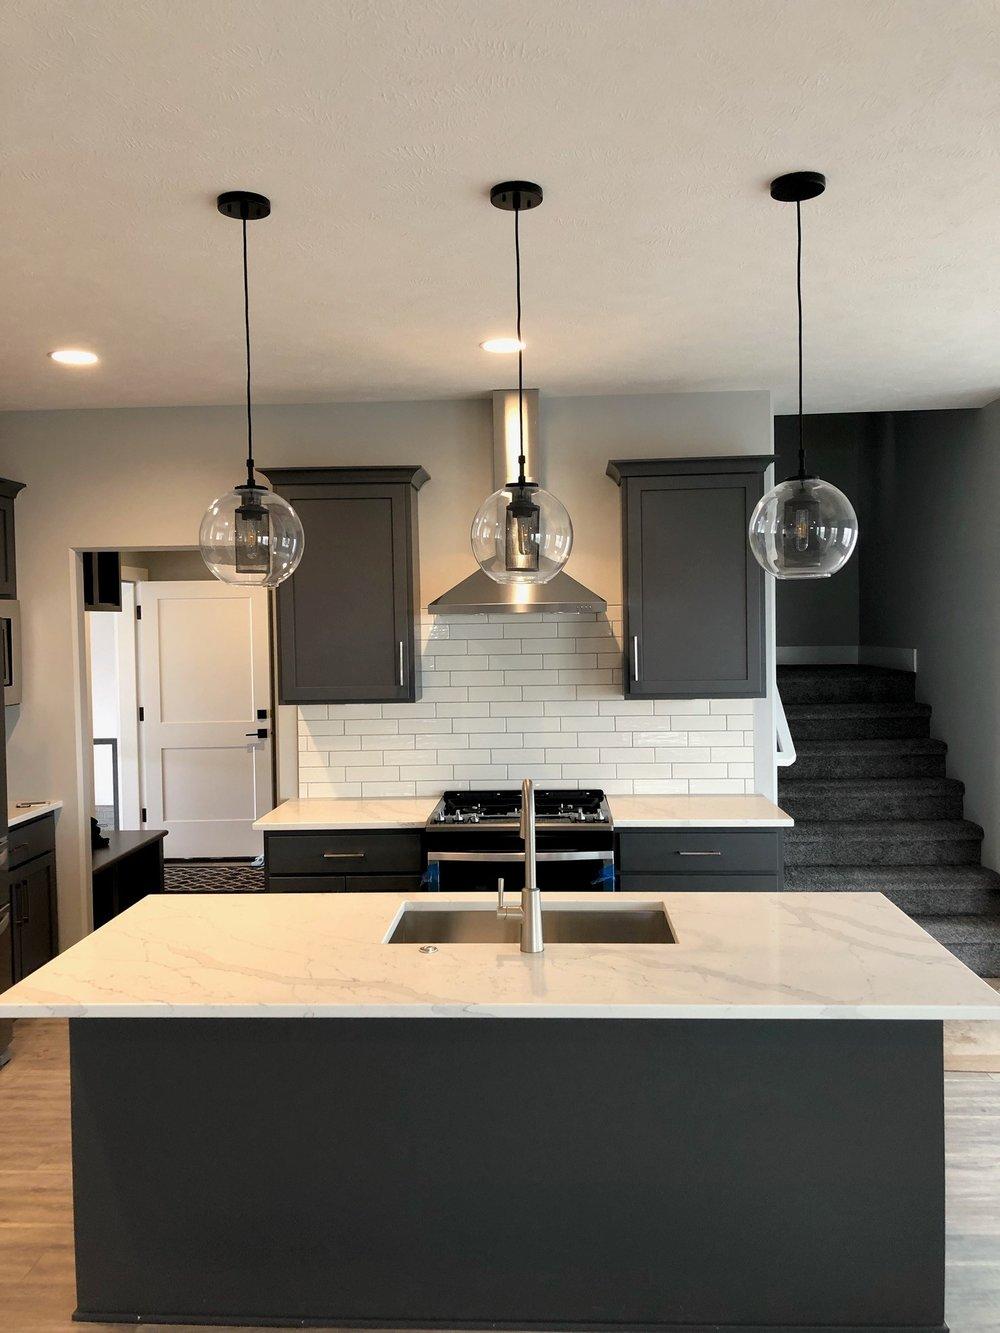 cadwell kitchen 6.jpg